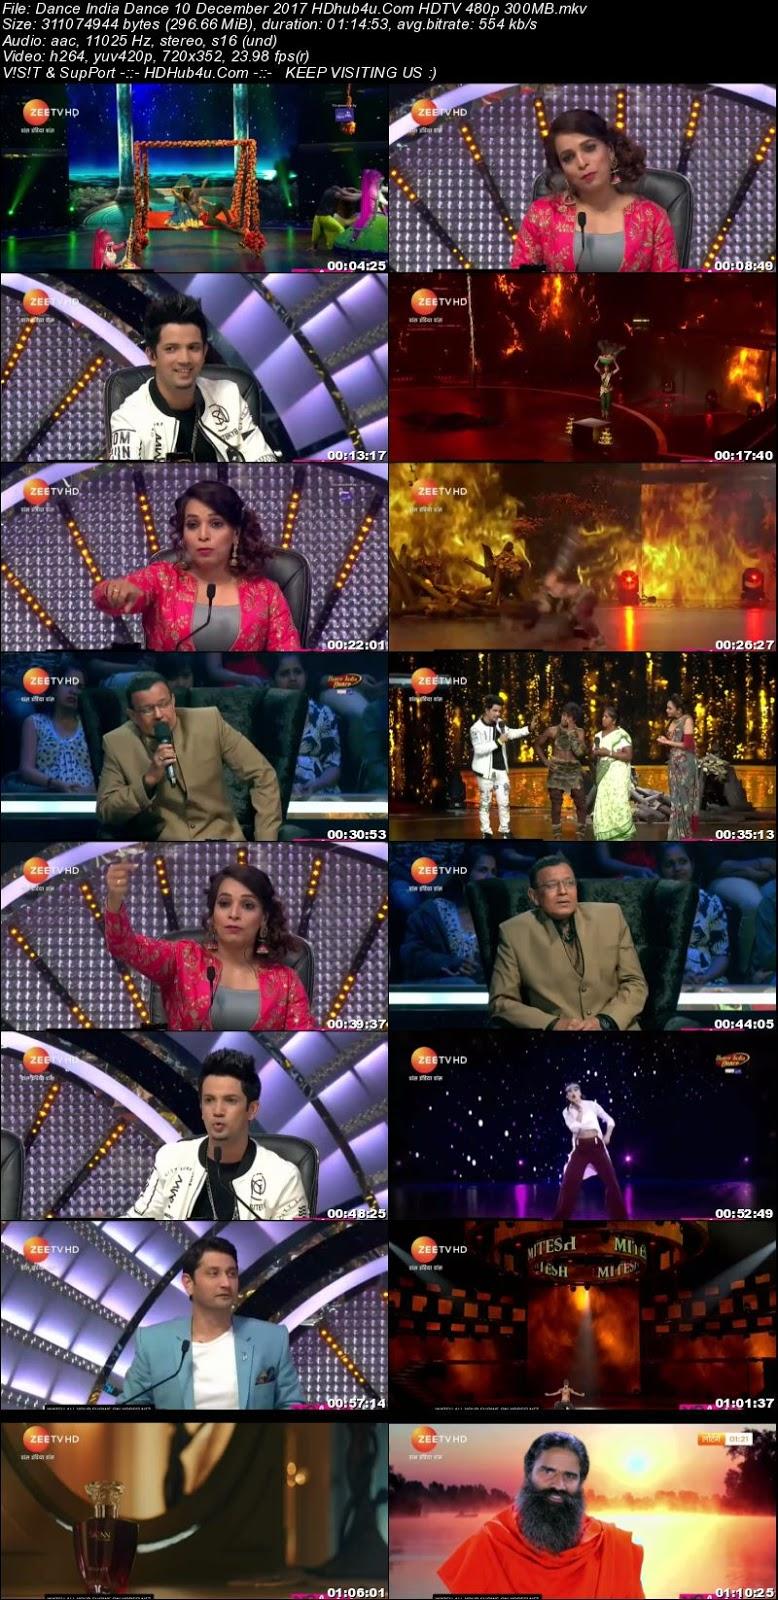 Dance India Dance 10th December 2017 480p HDTV 300MB Download